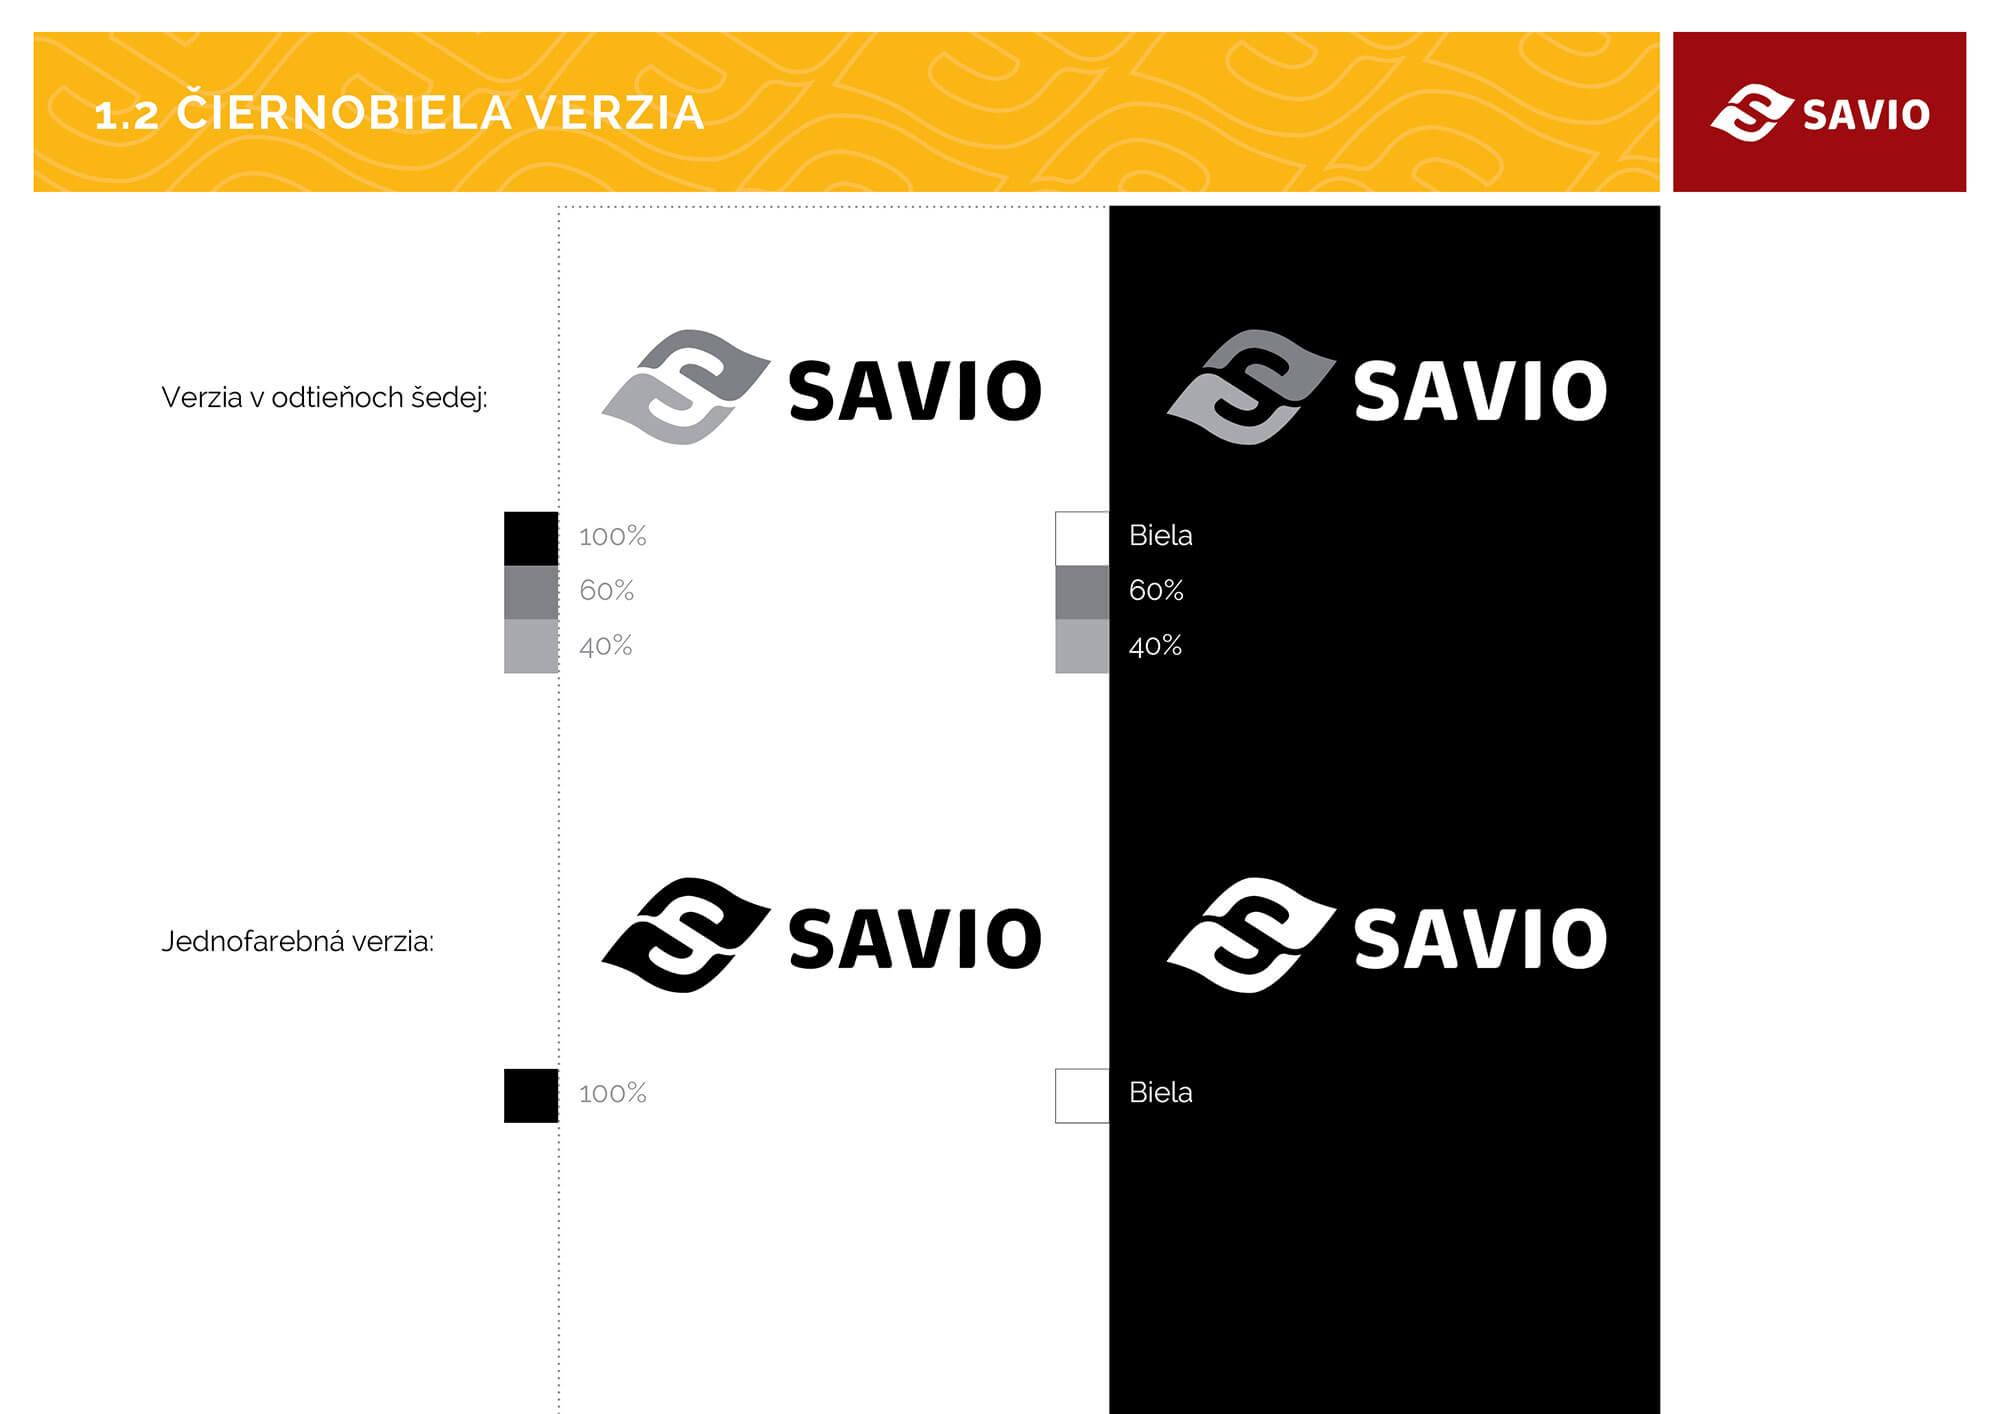 SAV-04-Strategia-CI-web-design-manual-v025